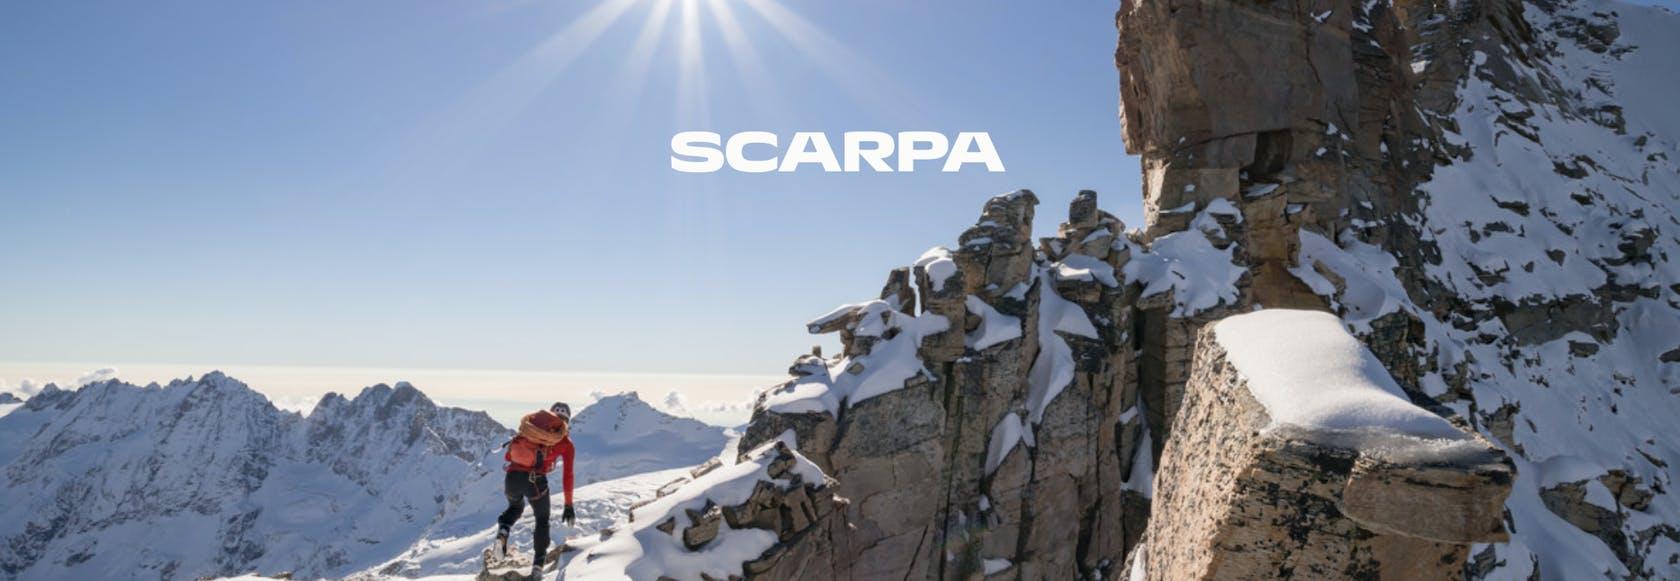 Scarpa Onlineshop